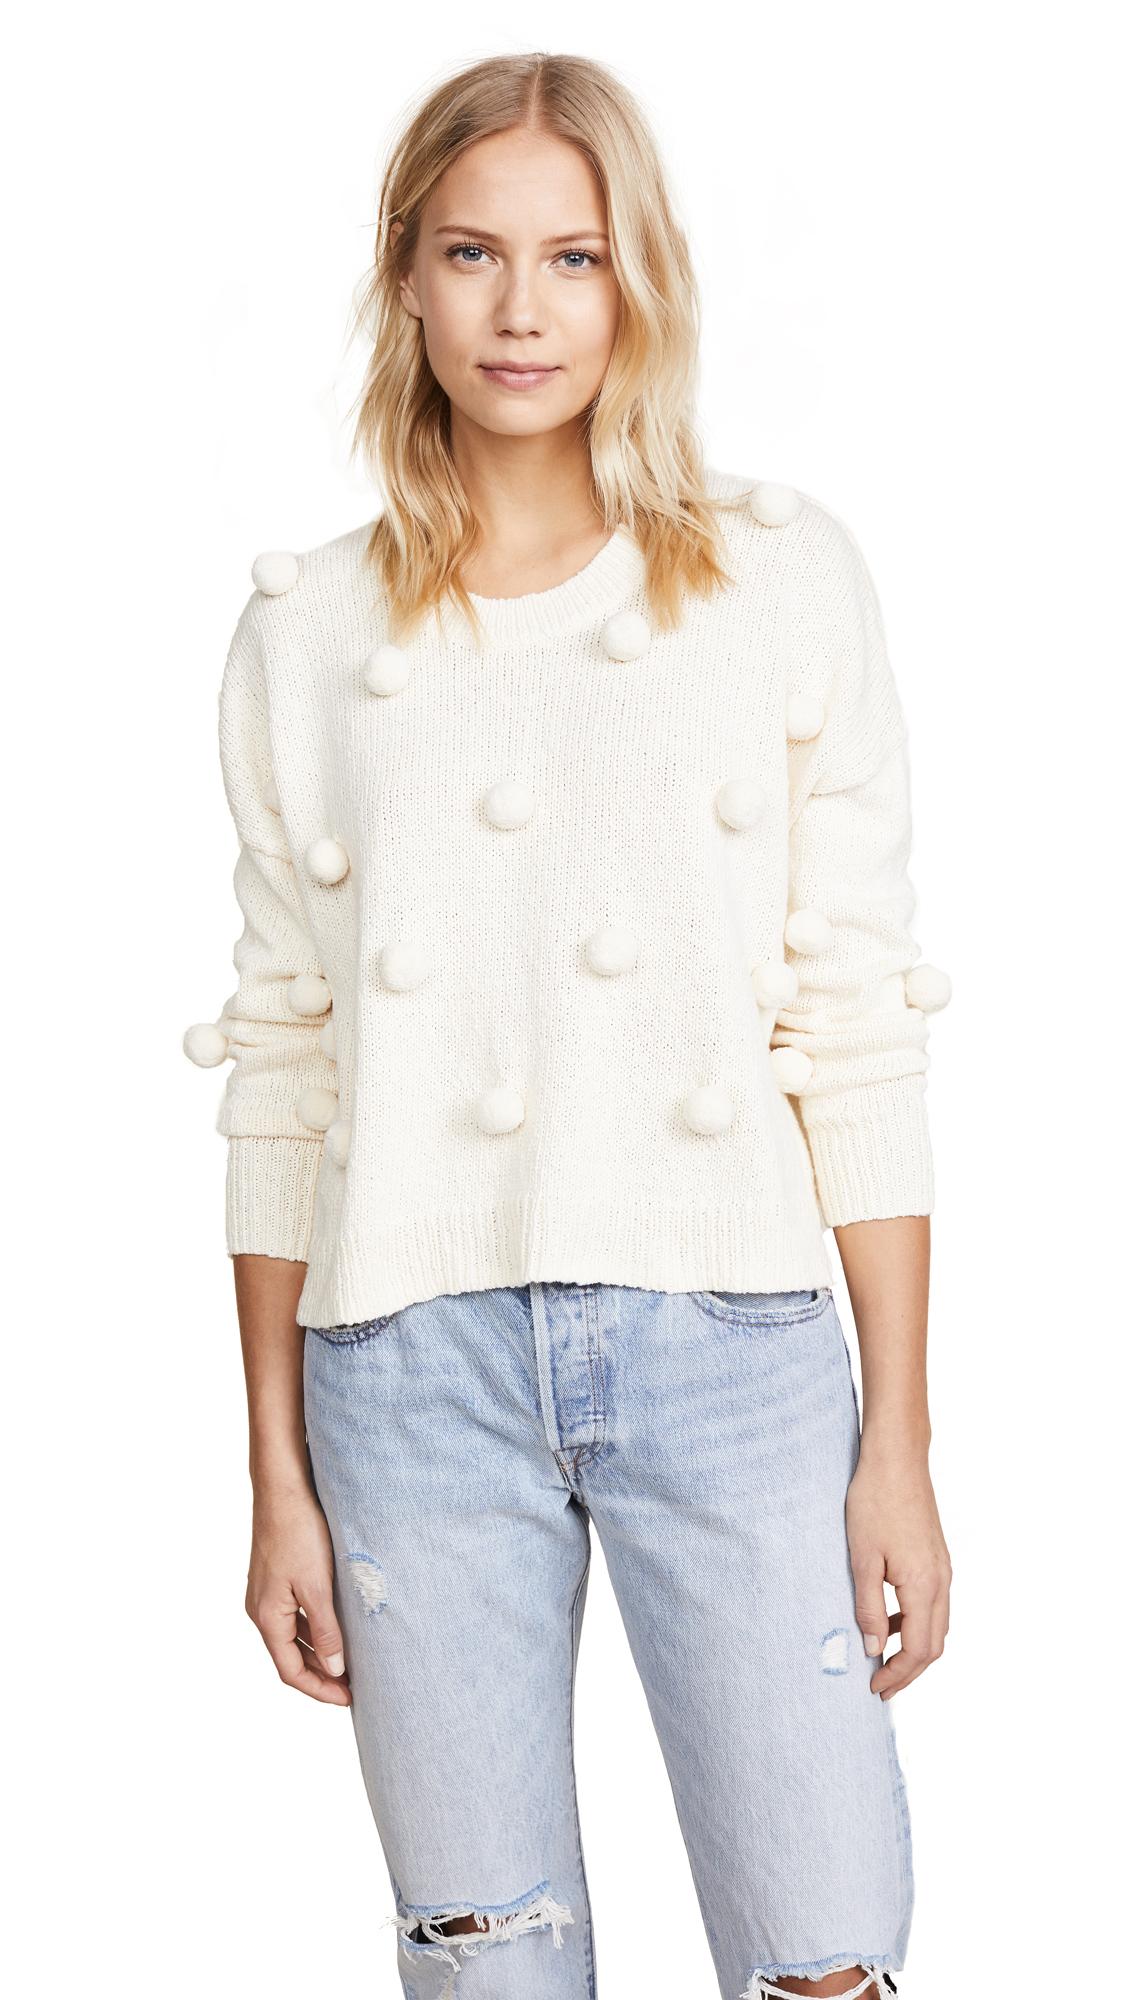 Madewell Pom Pom Pullover Shopbop